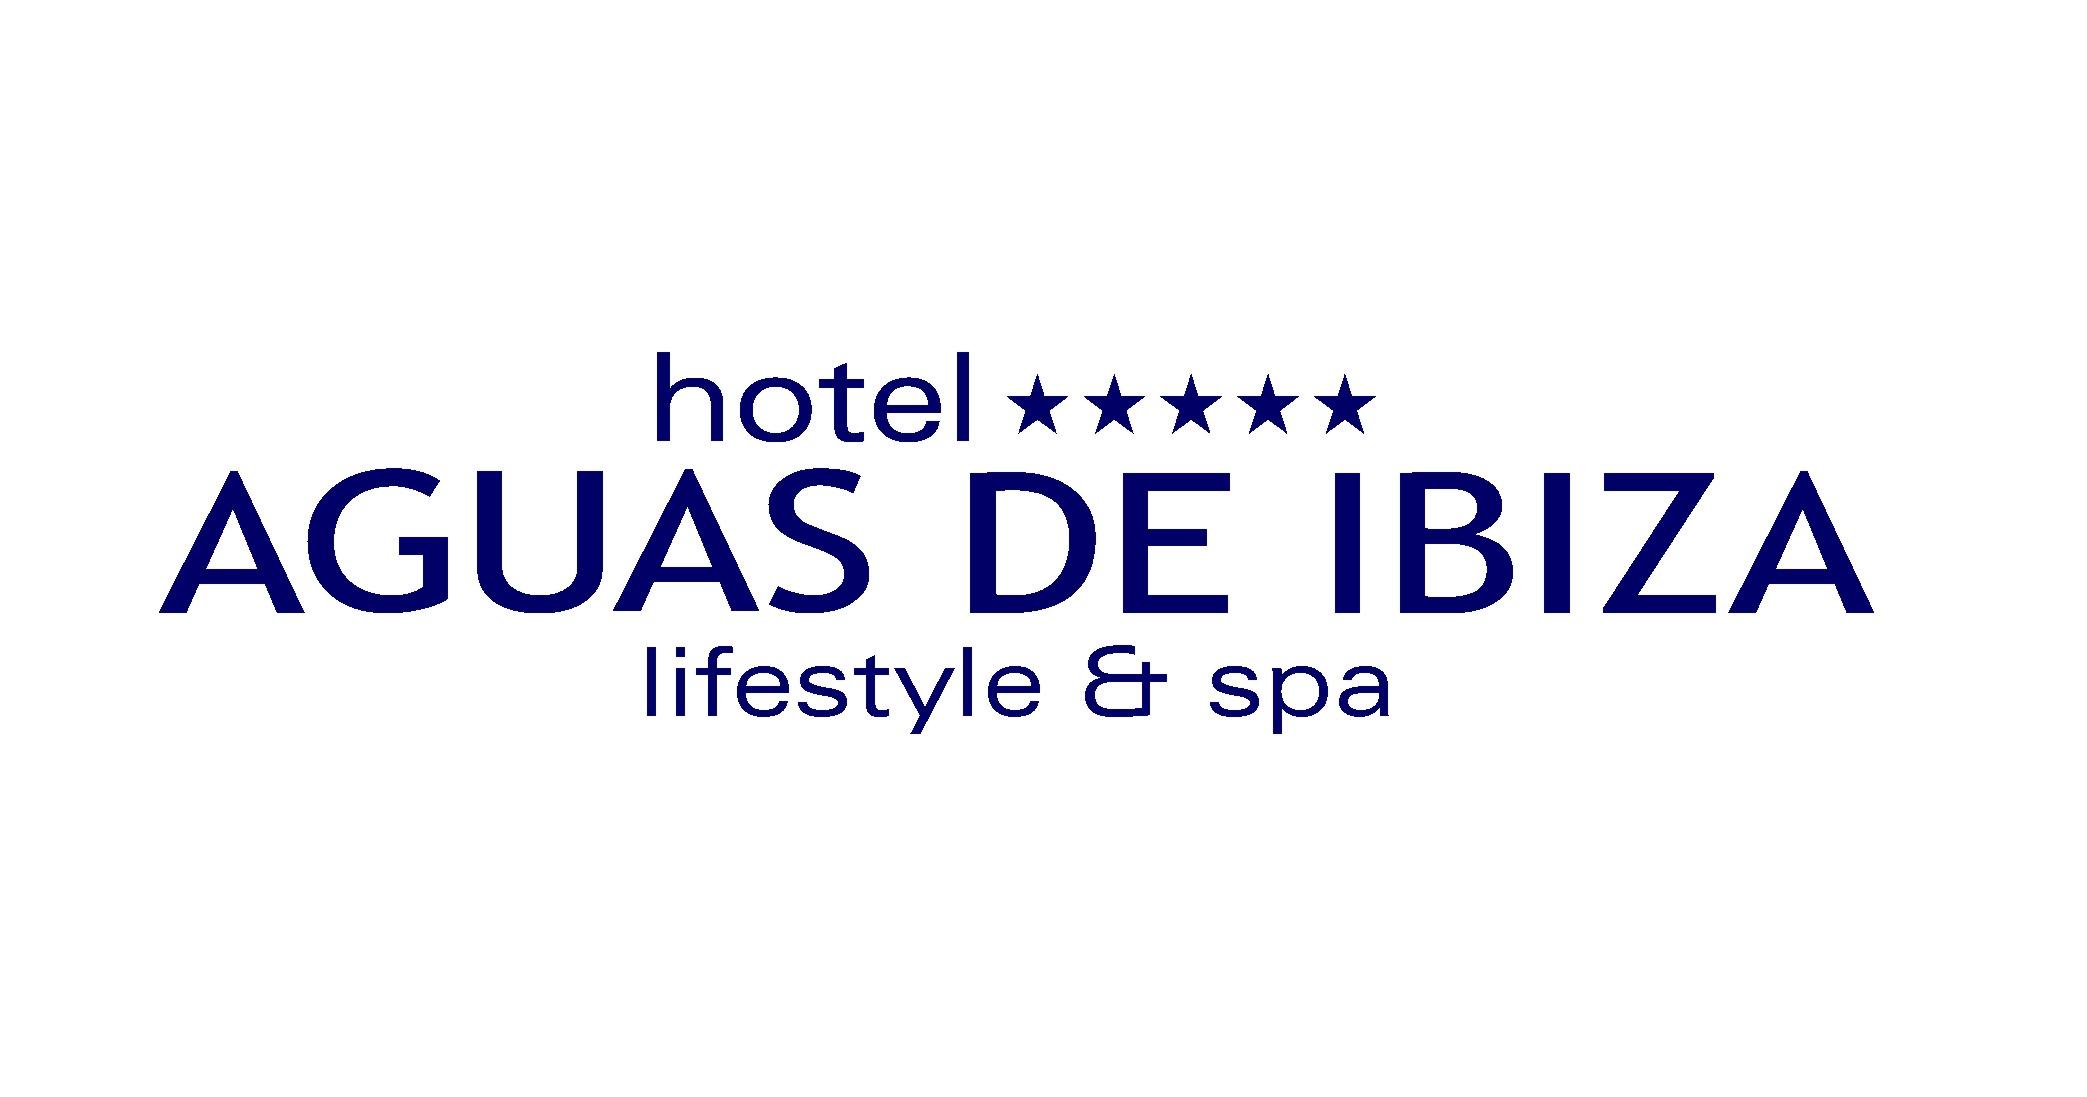 AGUAS DE IBIZA Lifestyle & Spa nuevo logo aprobado 9 jun 08